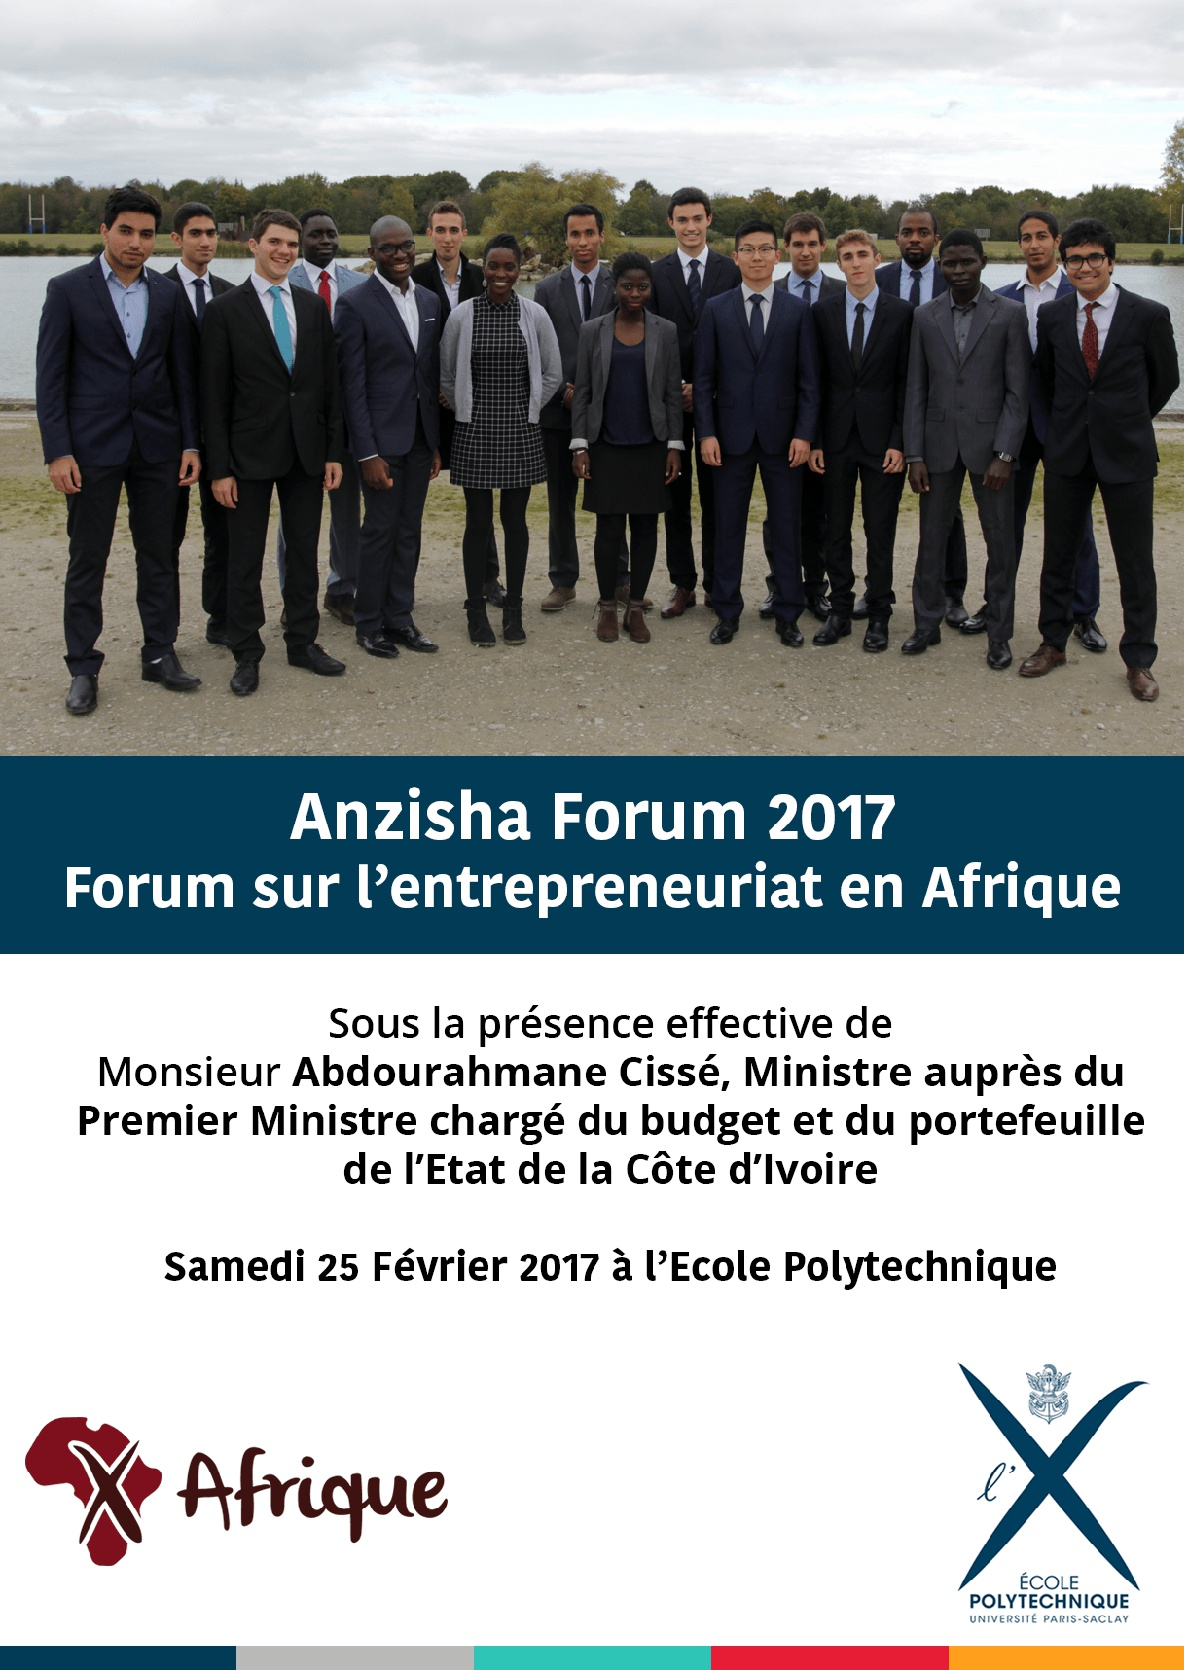 anzisha_forum_2017-001